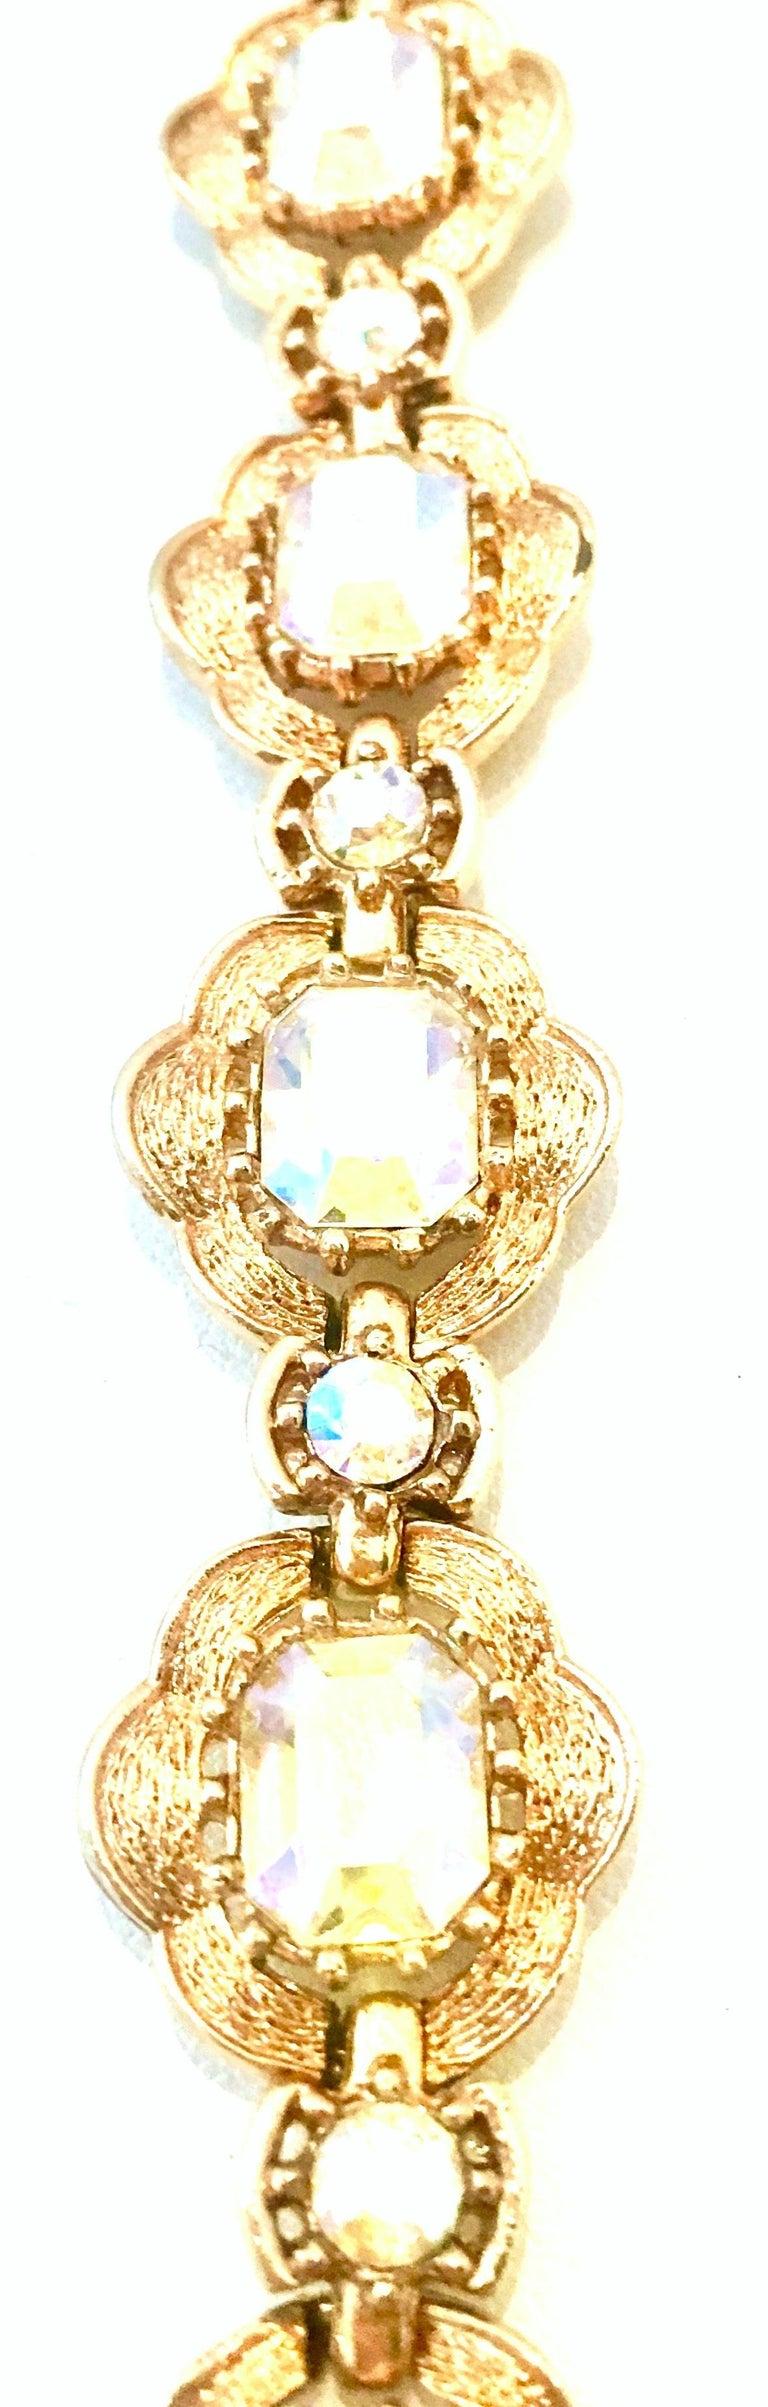 20th Century Gold & Swarovski Crystal Link Style Bracelet By, Coro For Sale 1